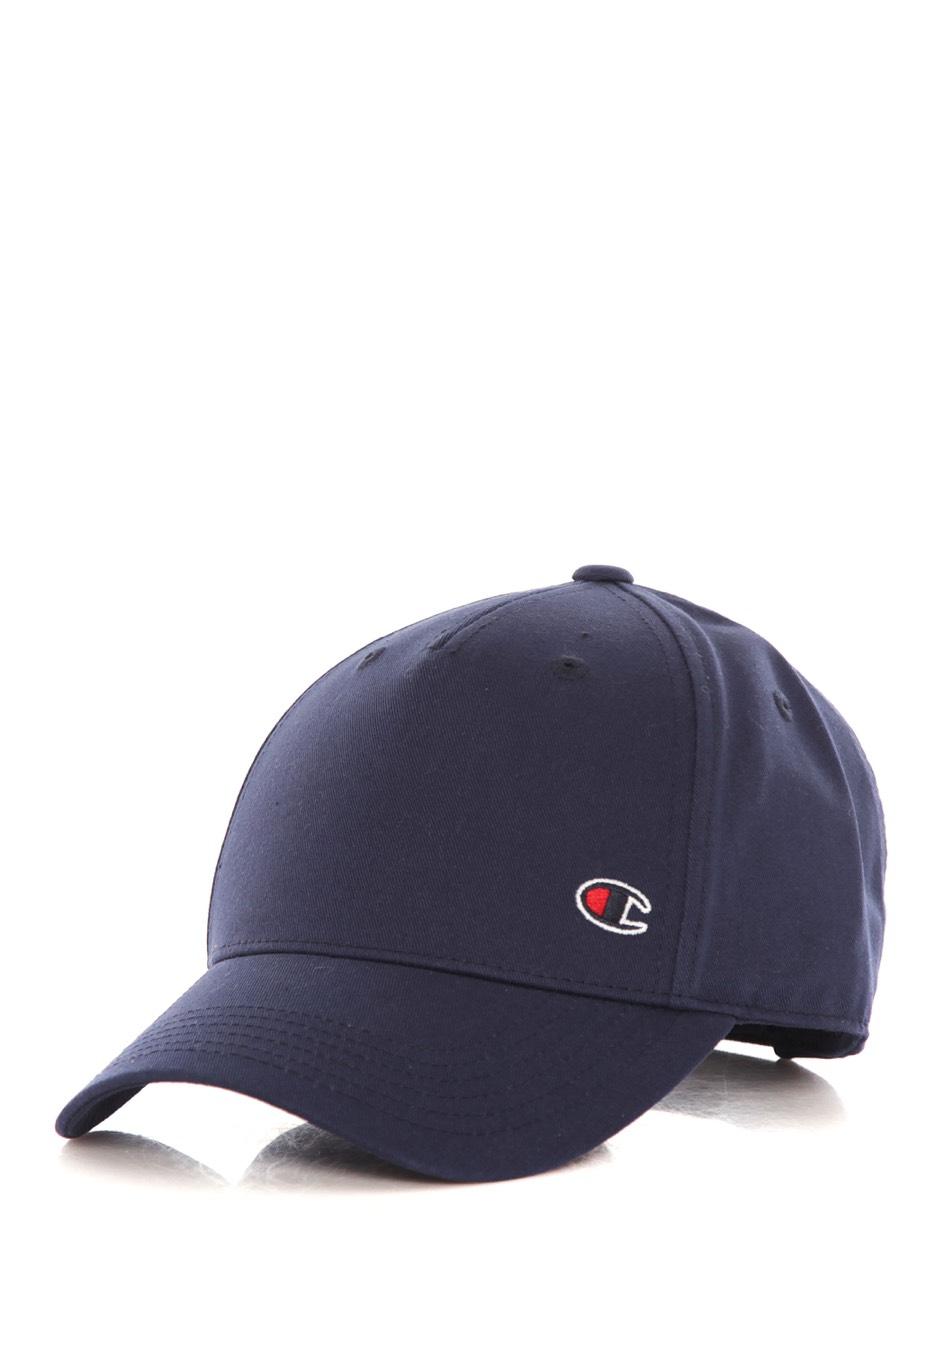 9f5828f3b6938 Champion - Baseball Magic Night Blue - Gorra - Tienda de marcas -  Impericon.com ES